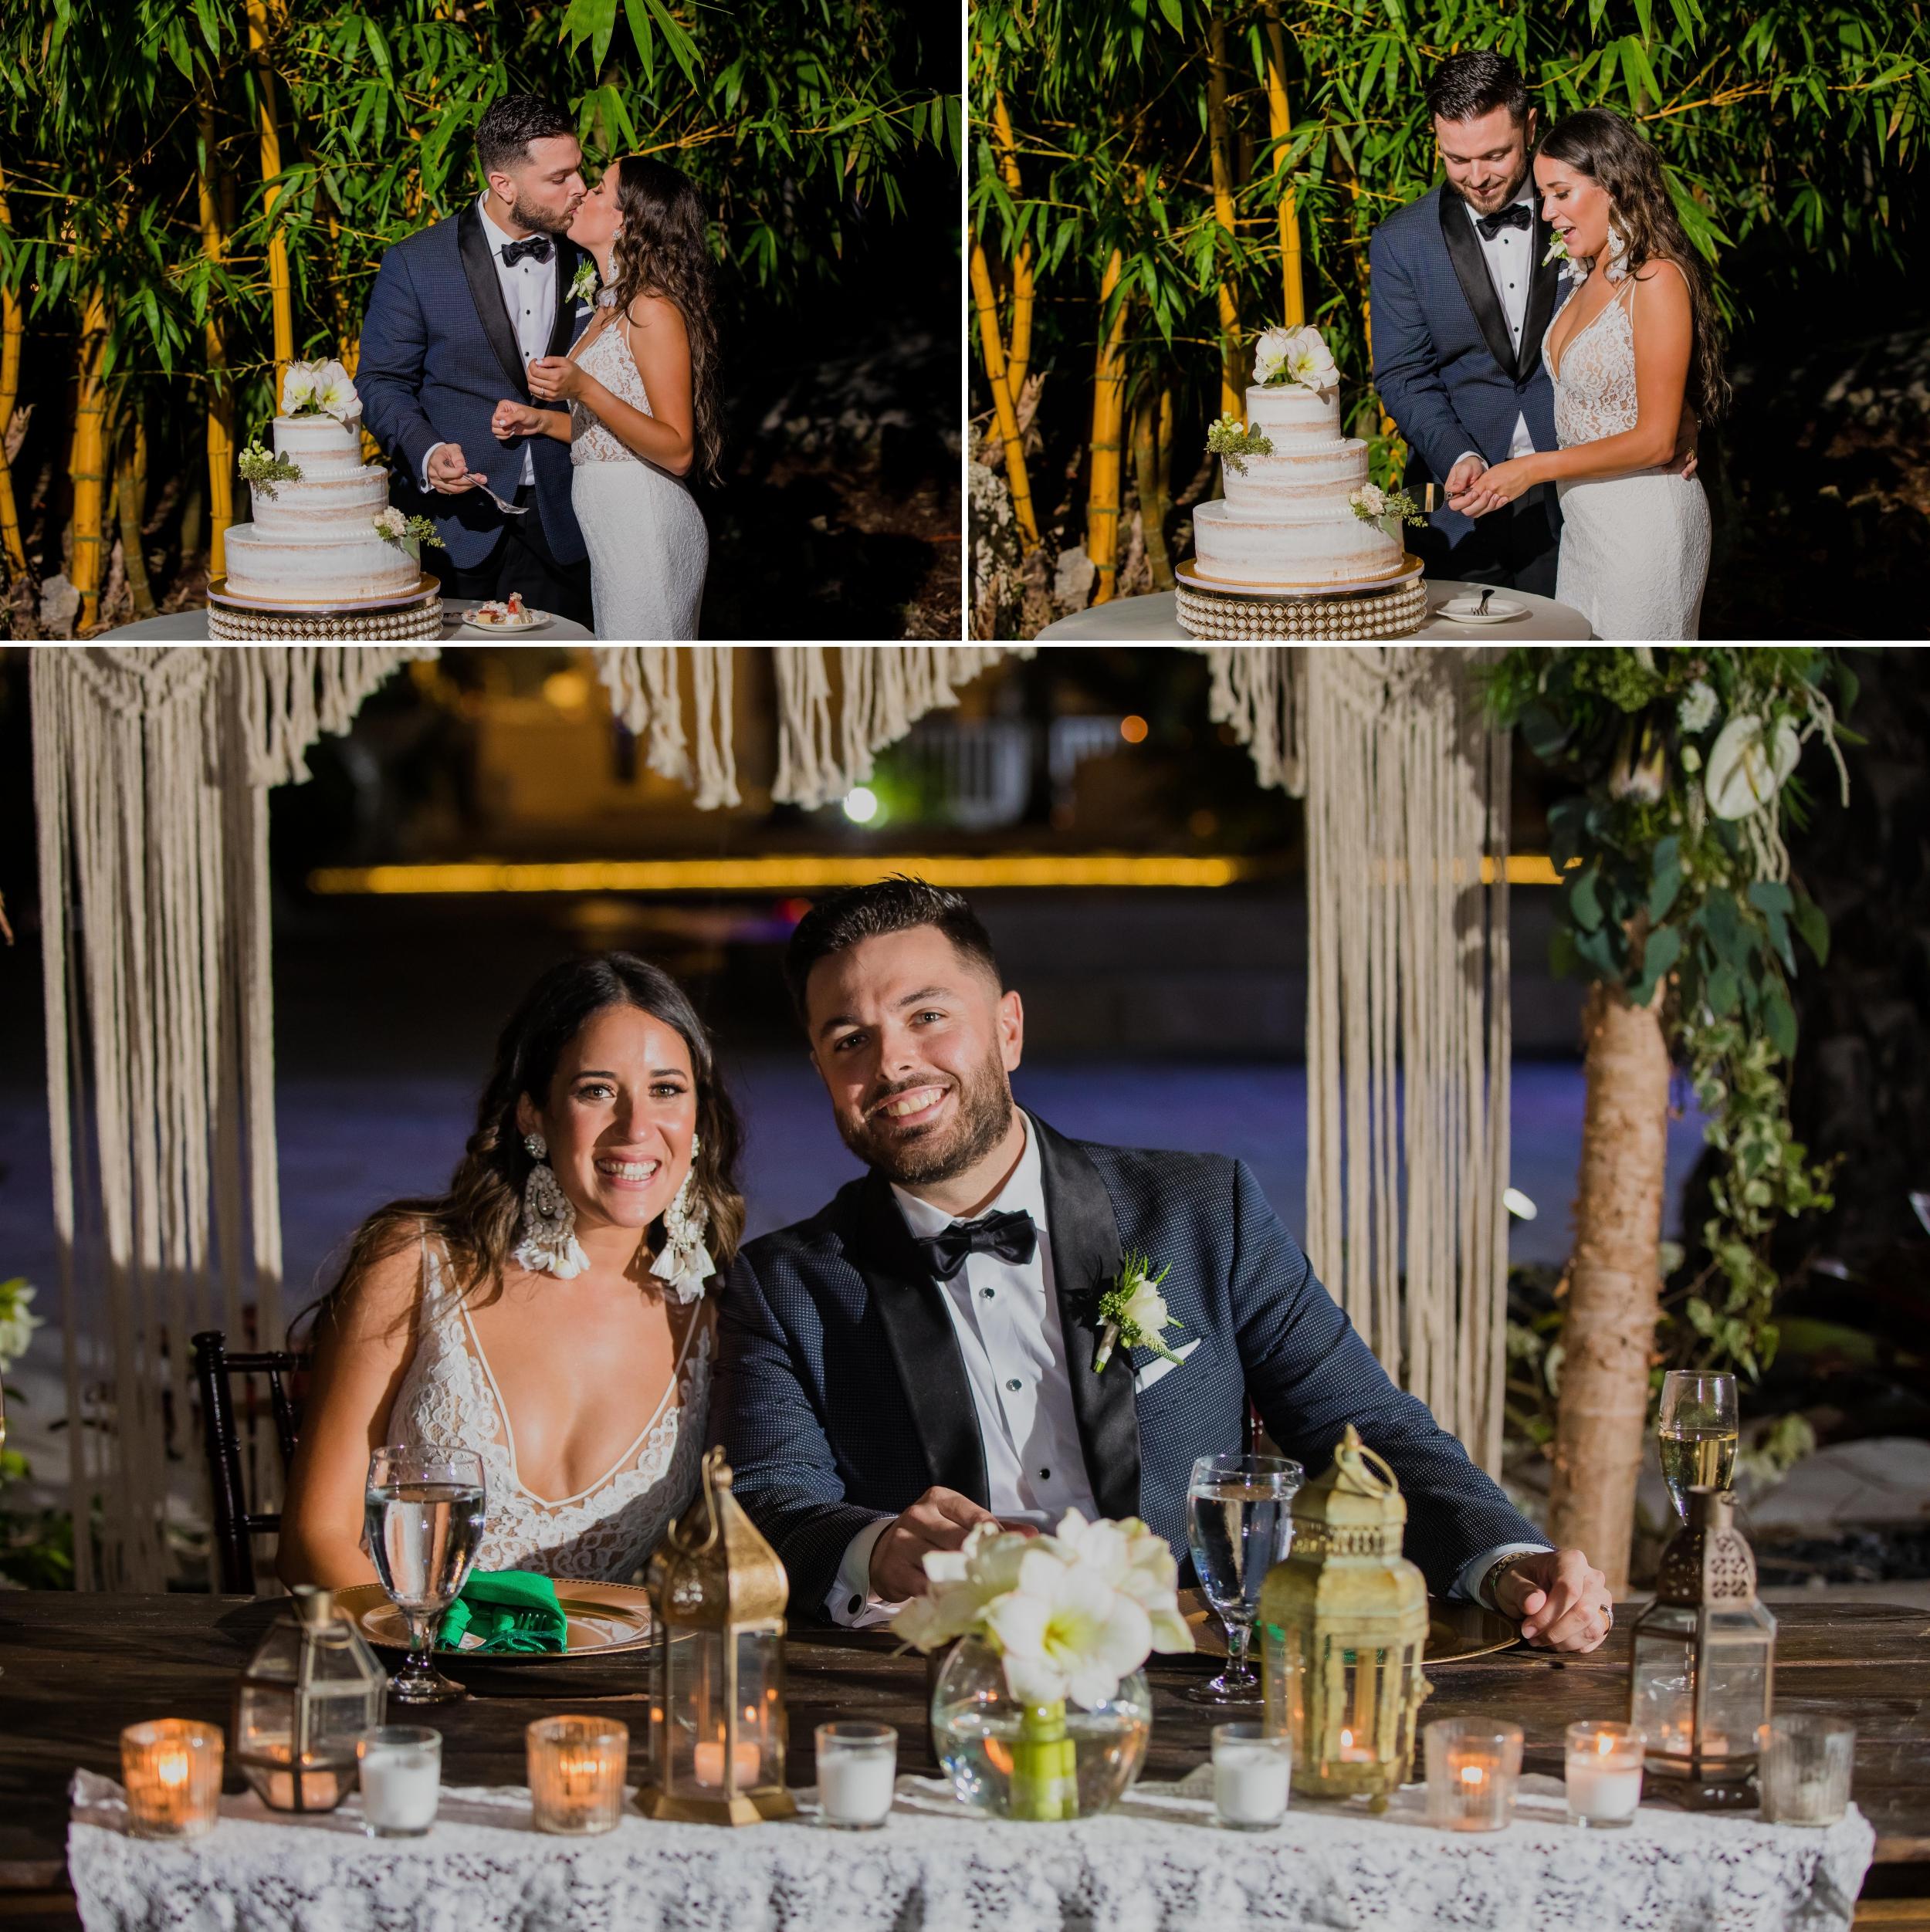 Wedding Whimsical Key West House  - Photography by Santy Martinez 21.jpg